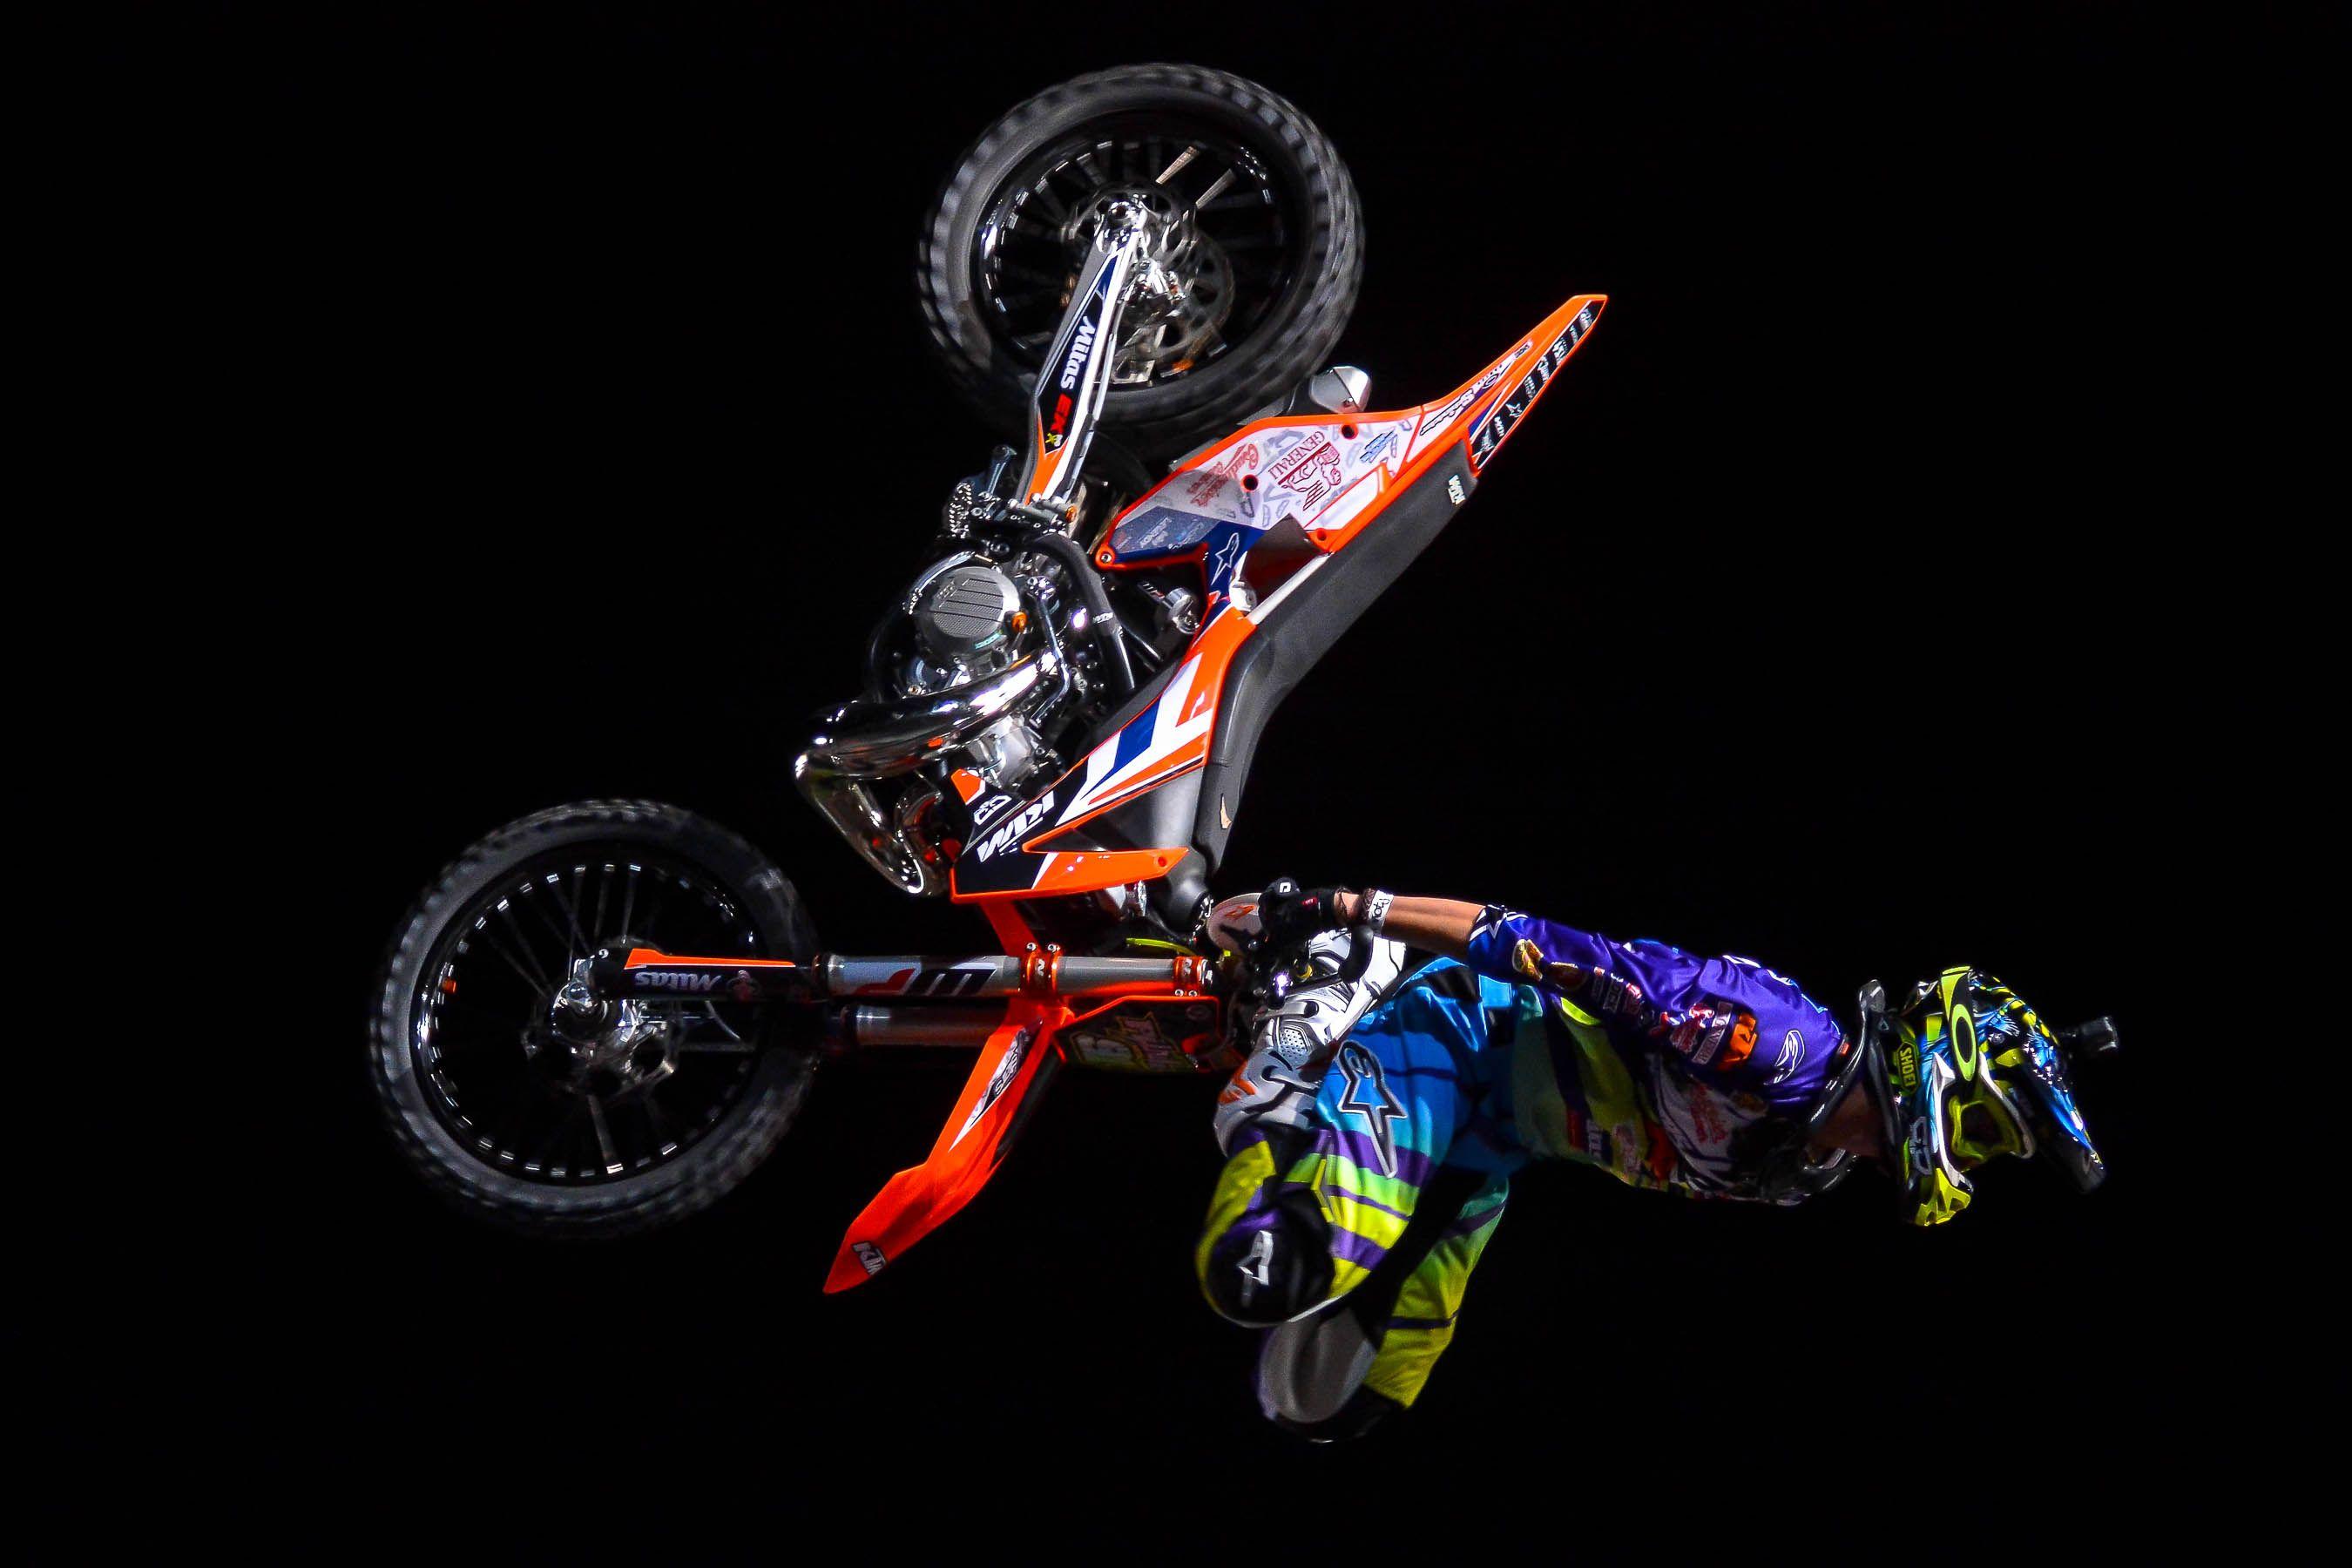 Campeonato de Freestyle de las Naciones, Jerez 30 SEPT 2016 | Christian Cantizano para MIRA Jerez